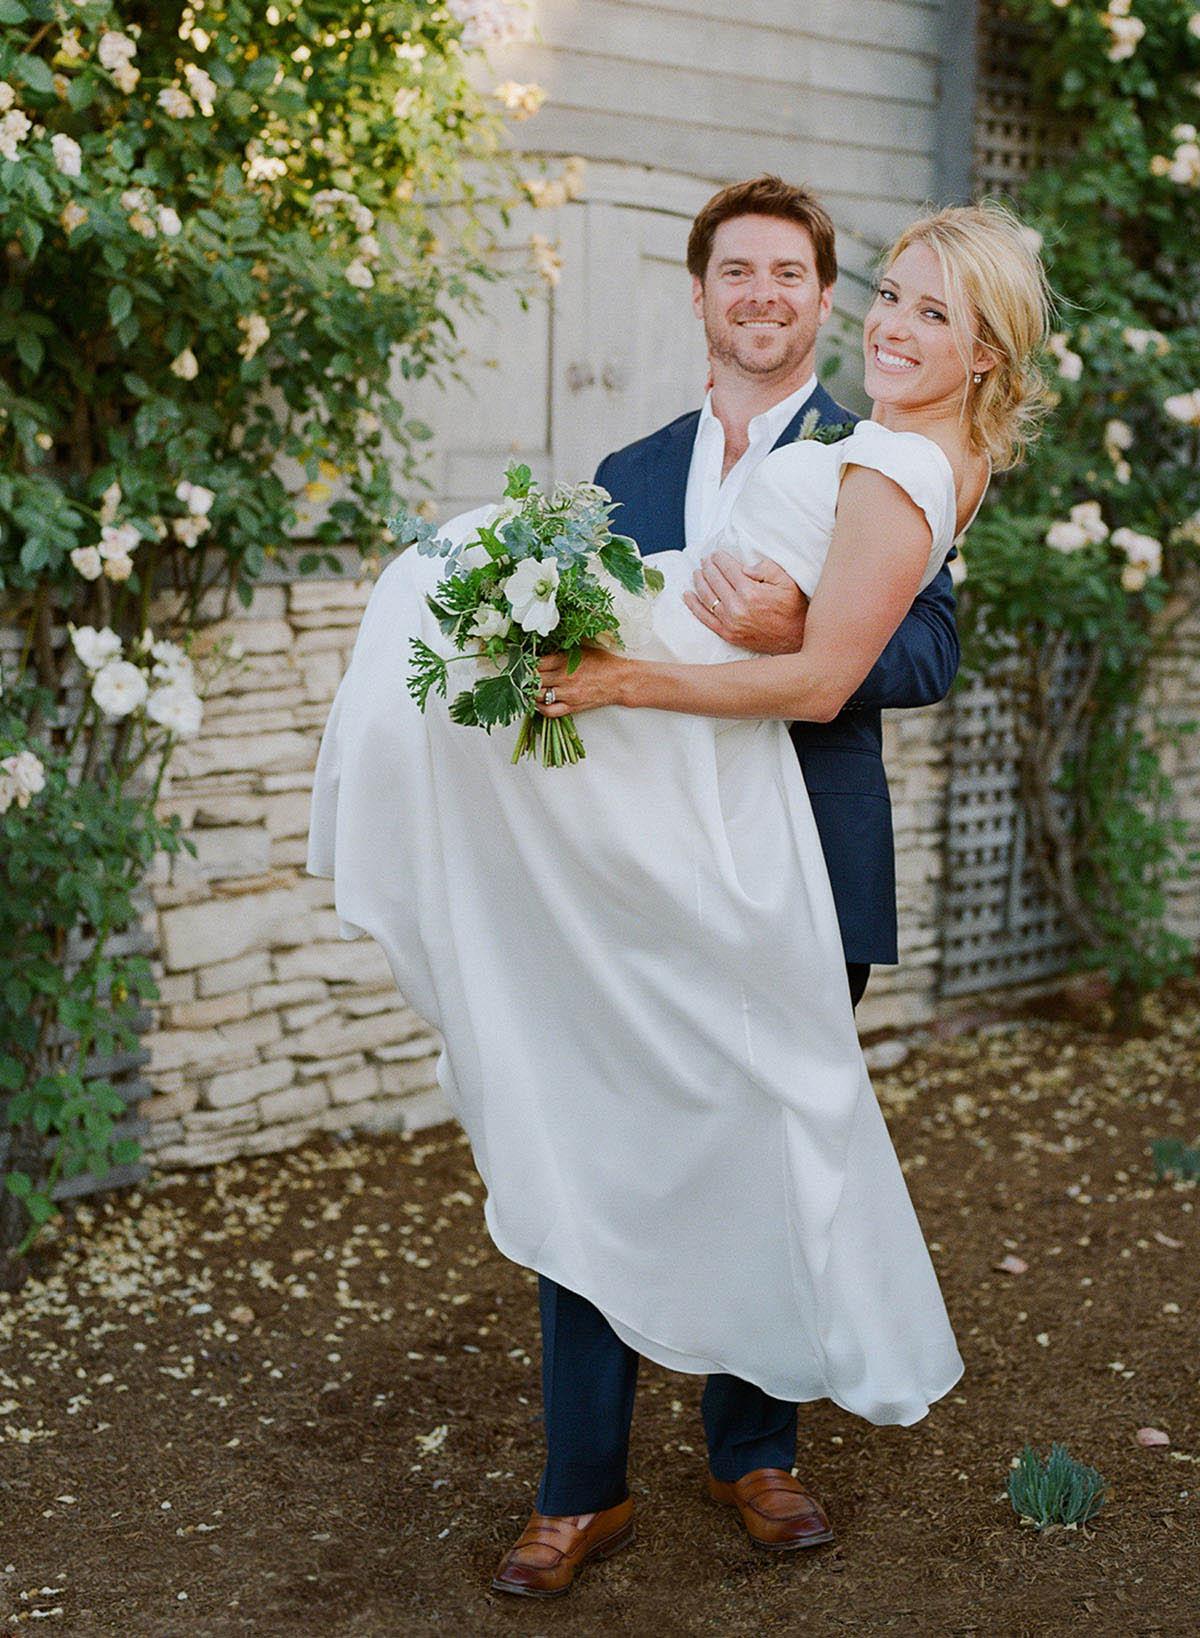 39-bride-groom-threshold-shot.jpg